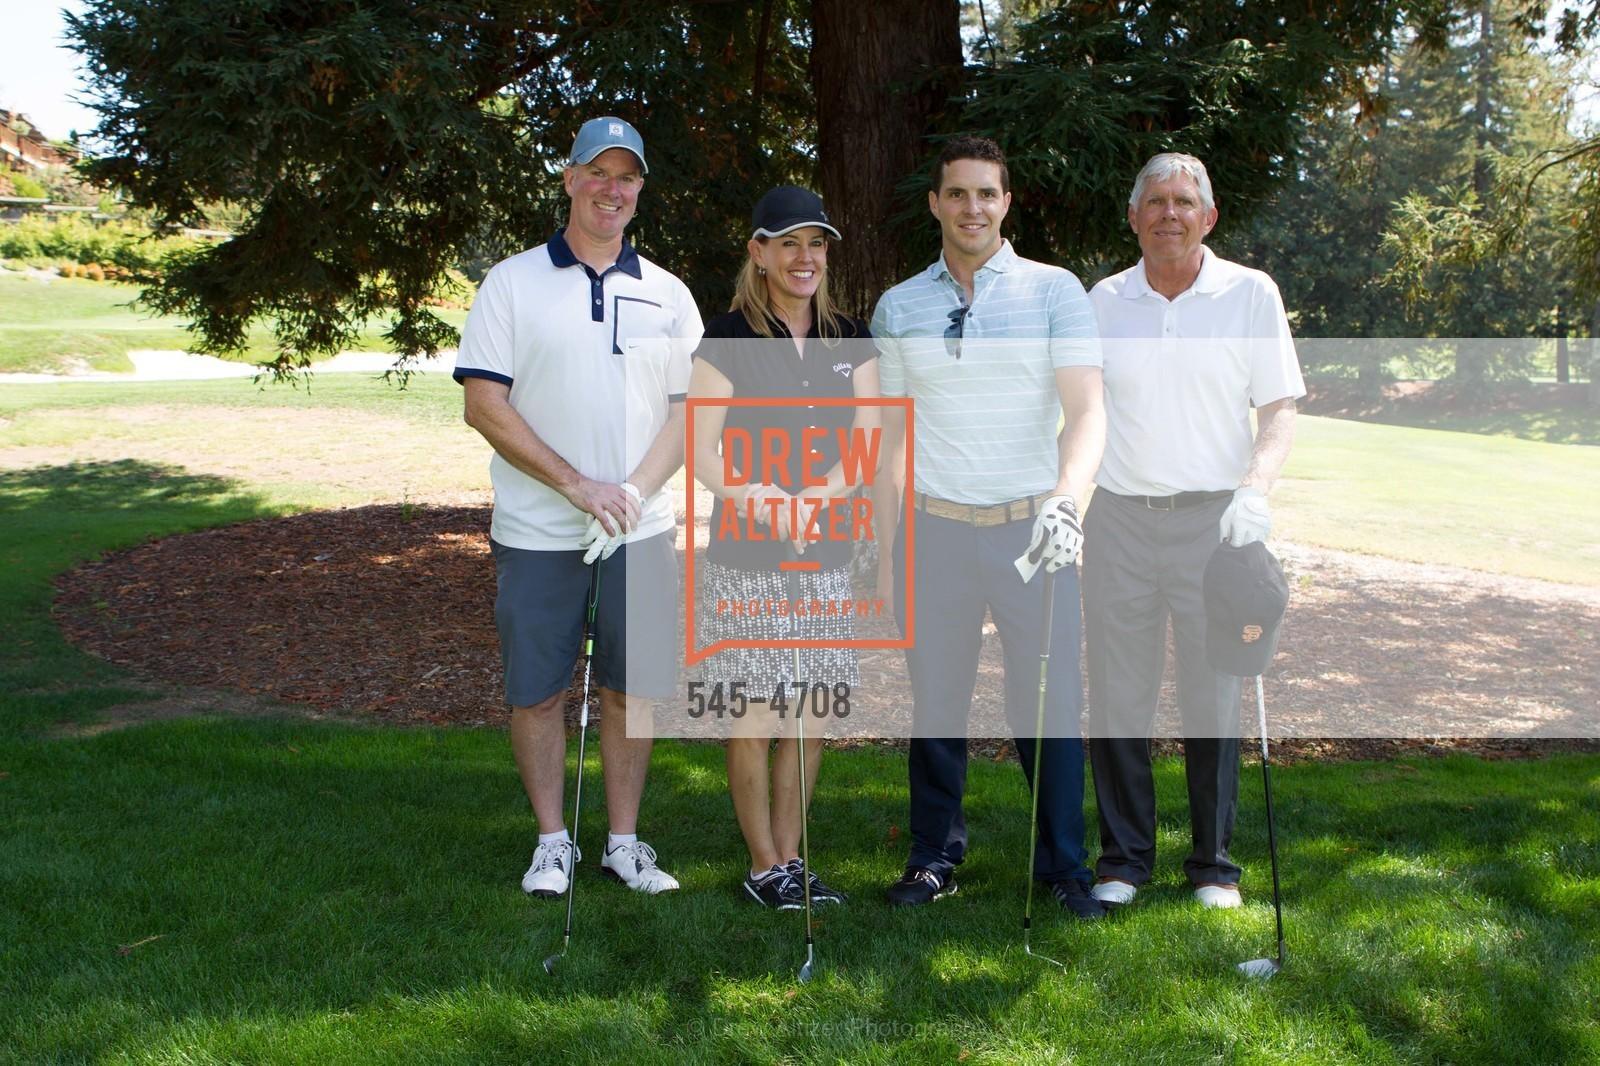 Dan Smith, Tina Michelson, David Perrez, Chris Dunn, Photo #545-4708